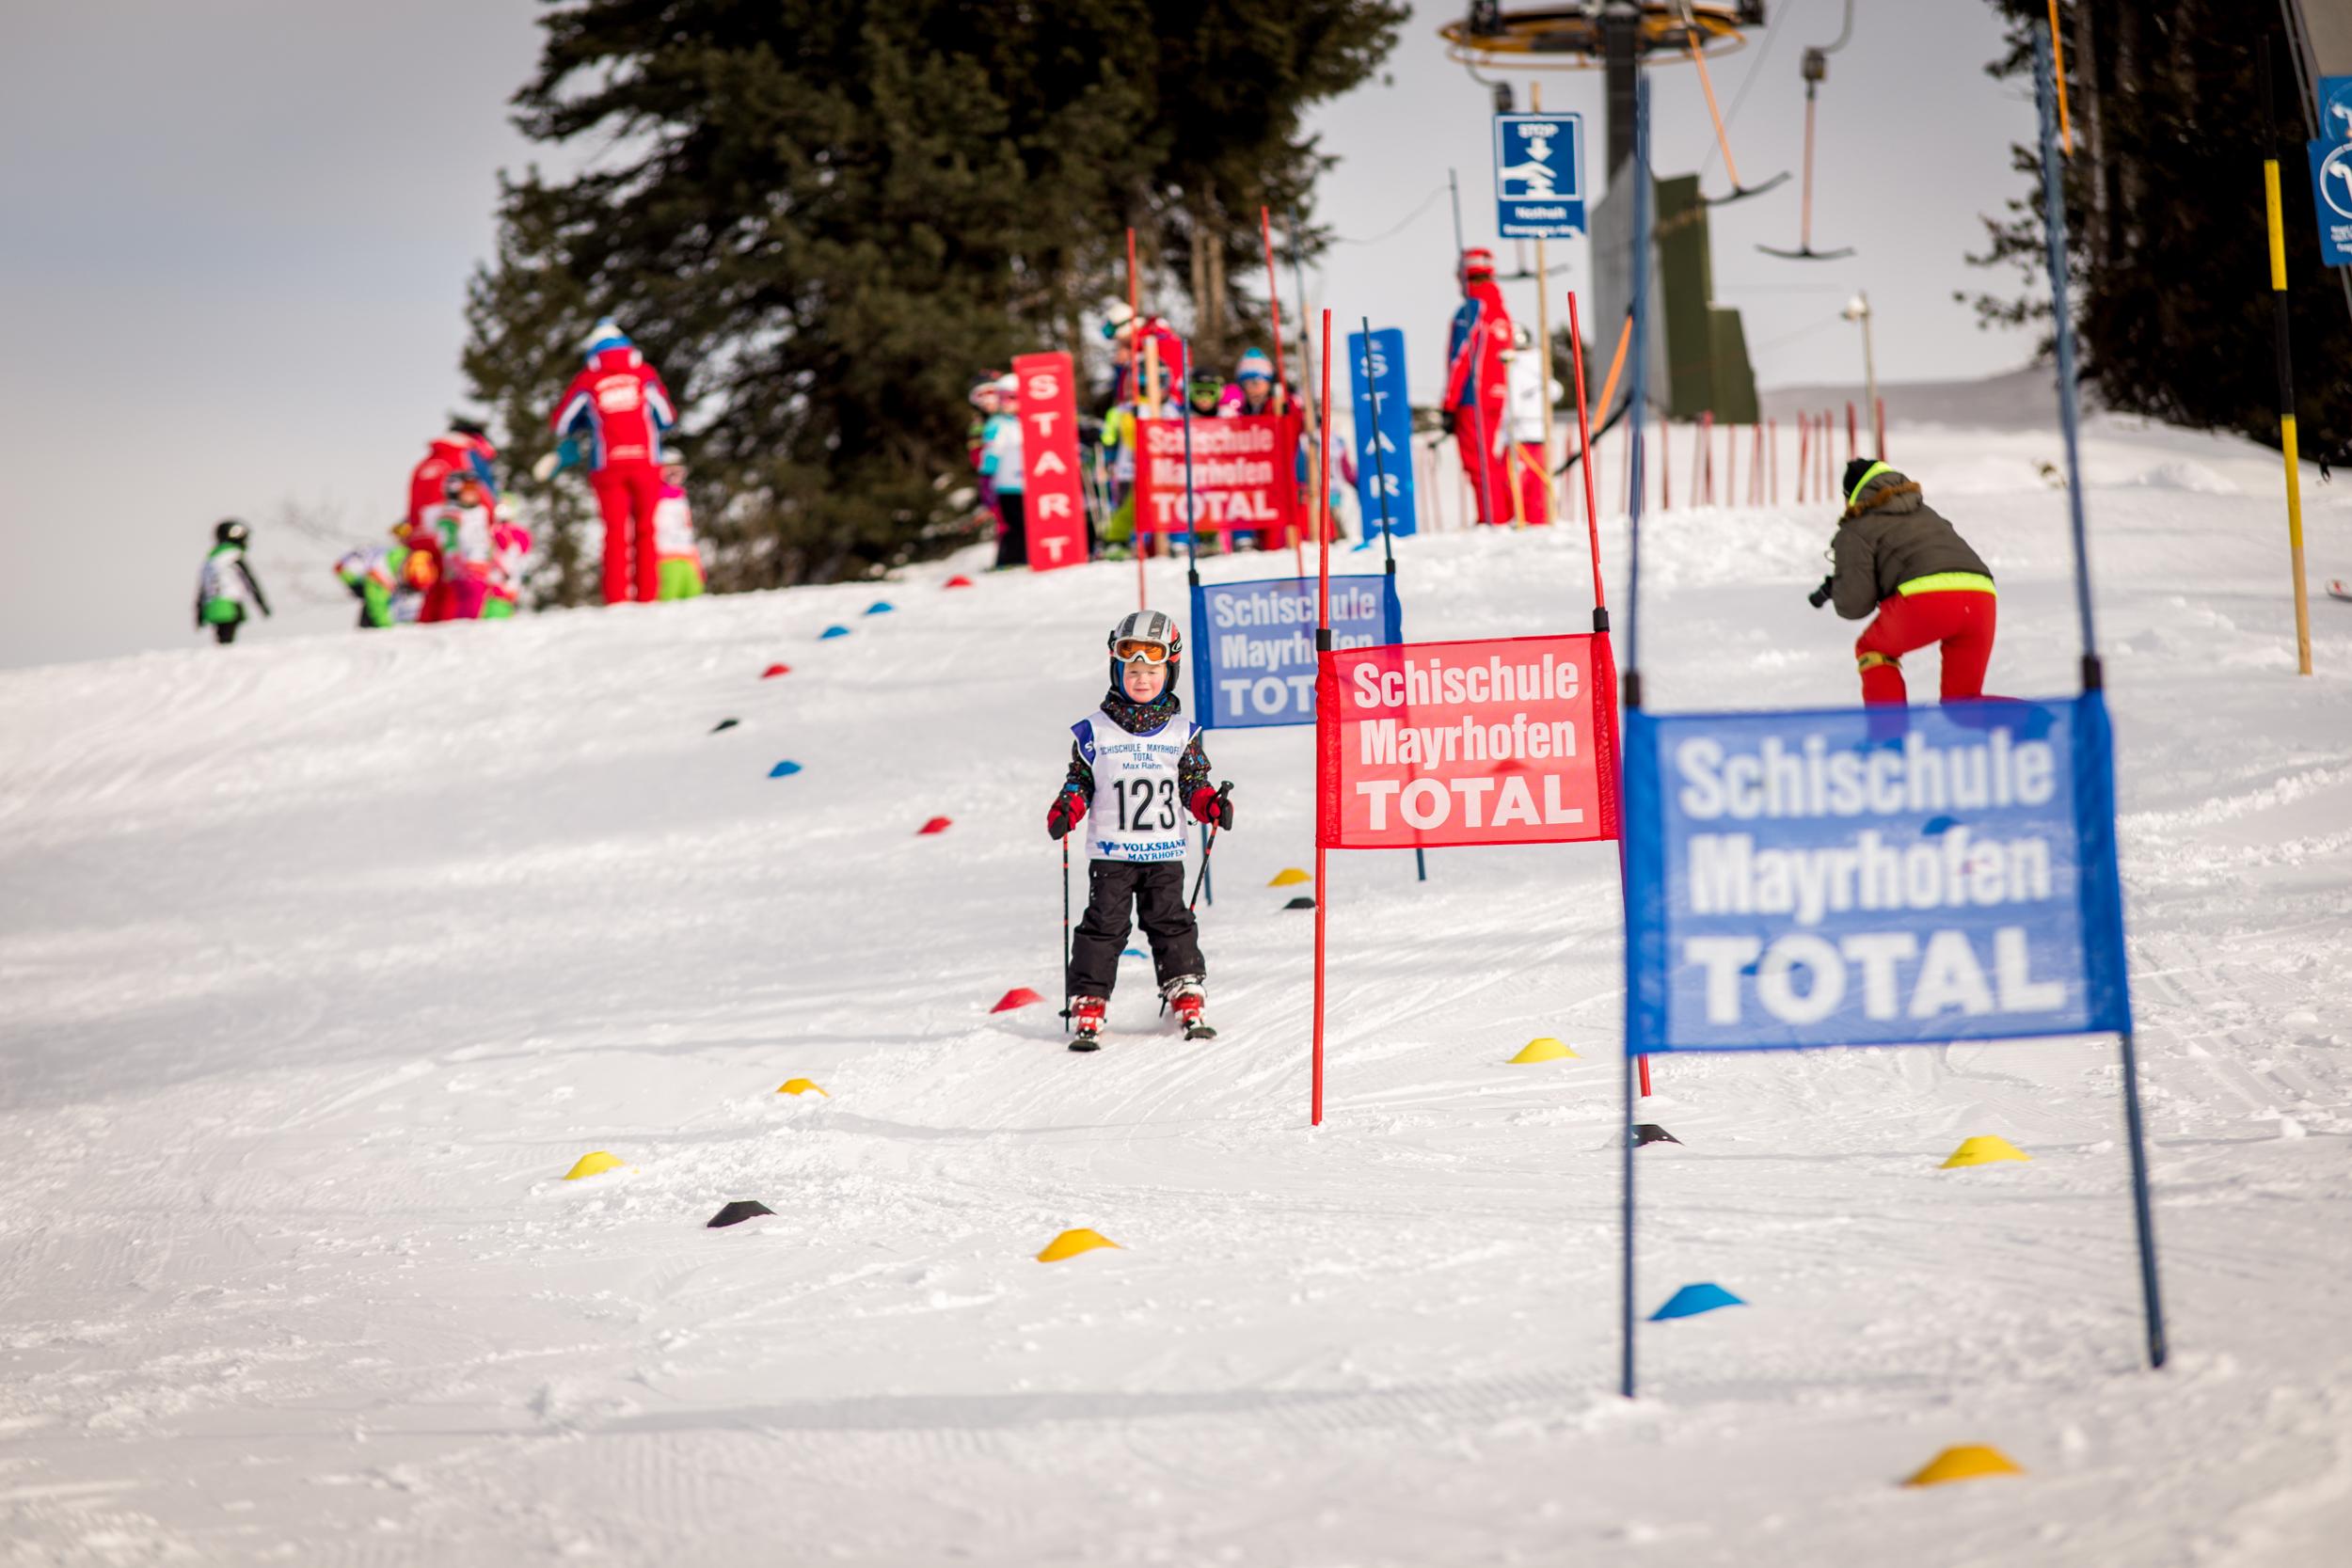 ski race 16_0083.jpg